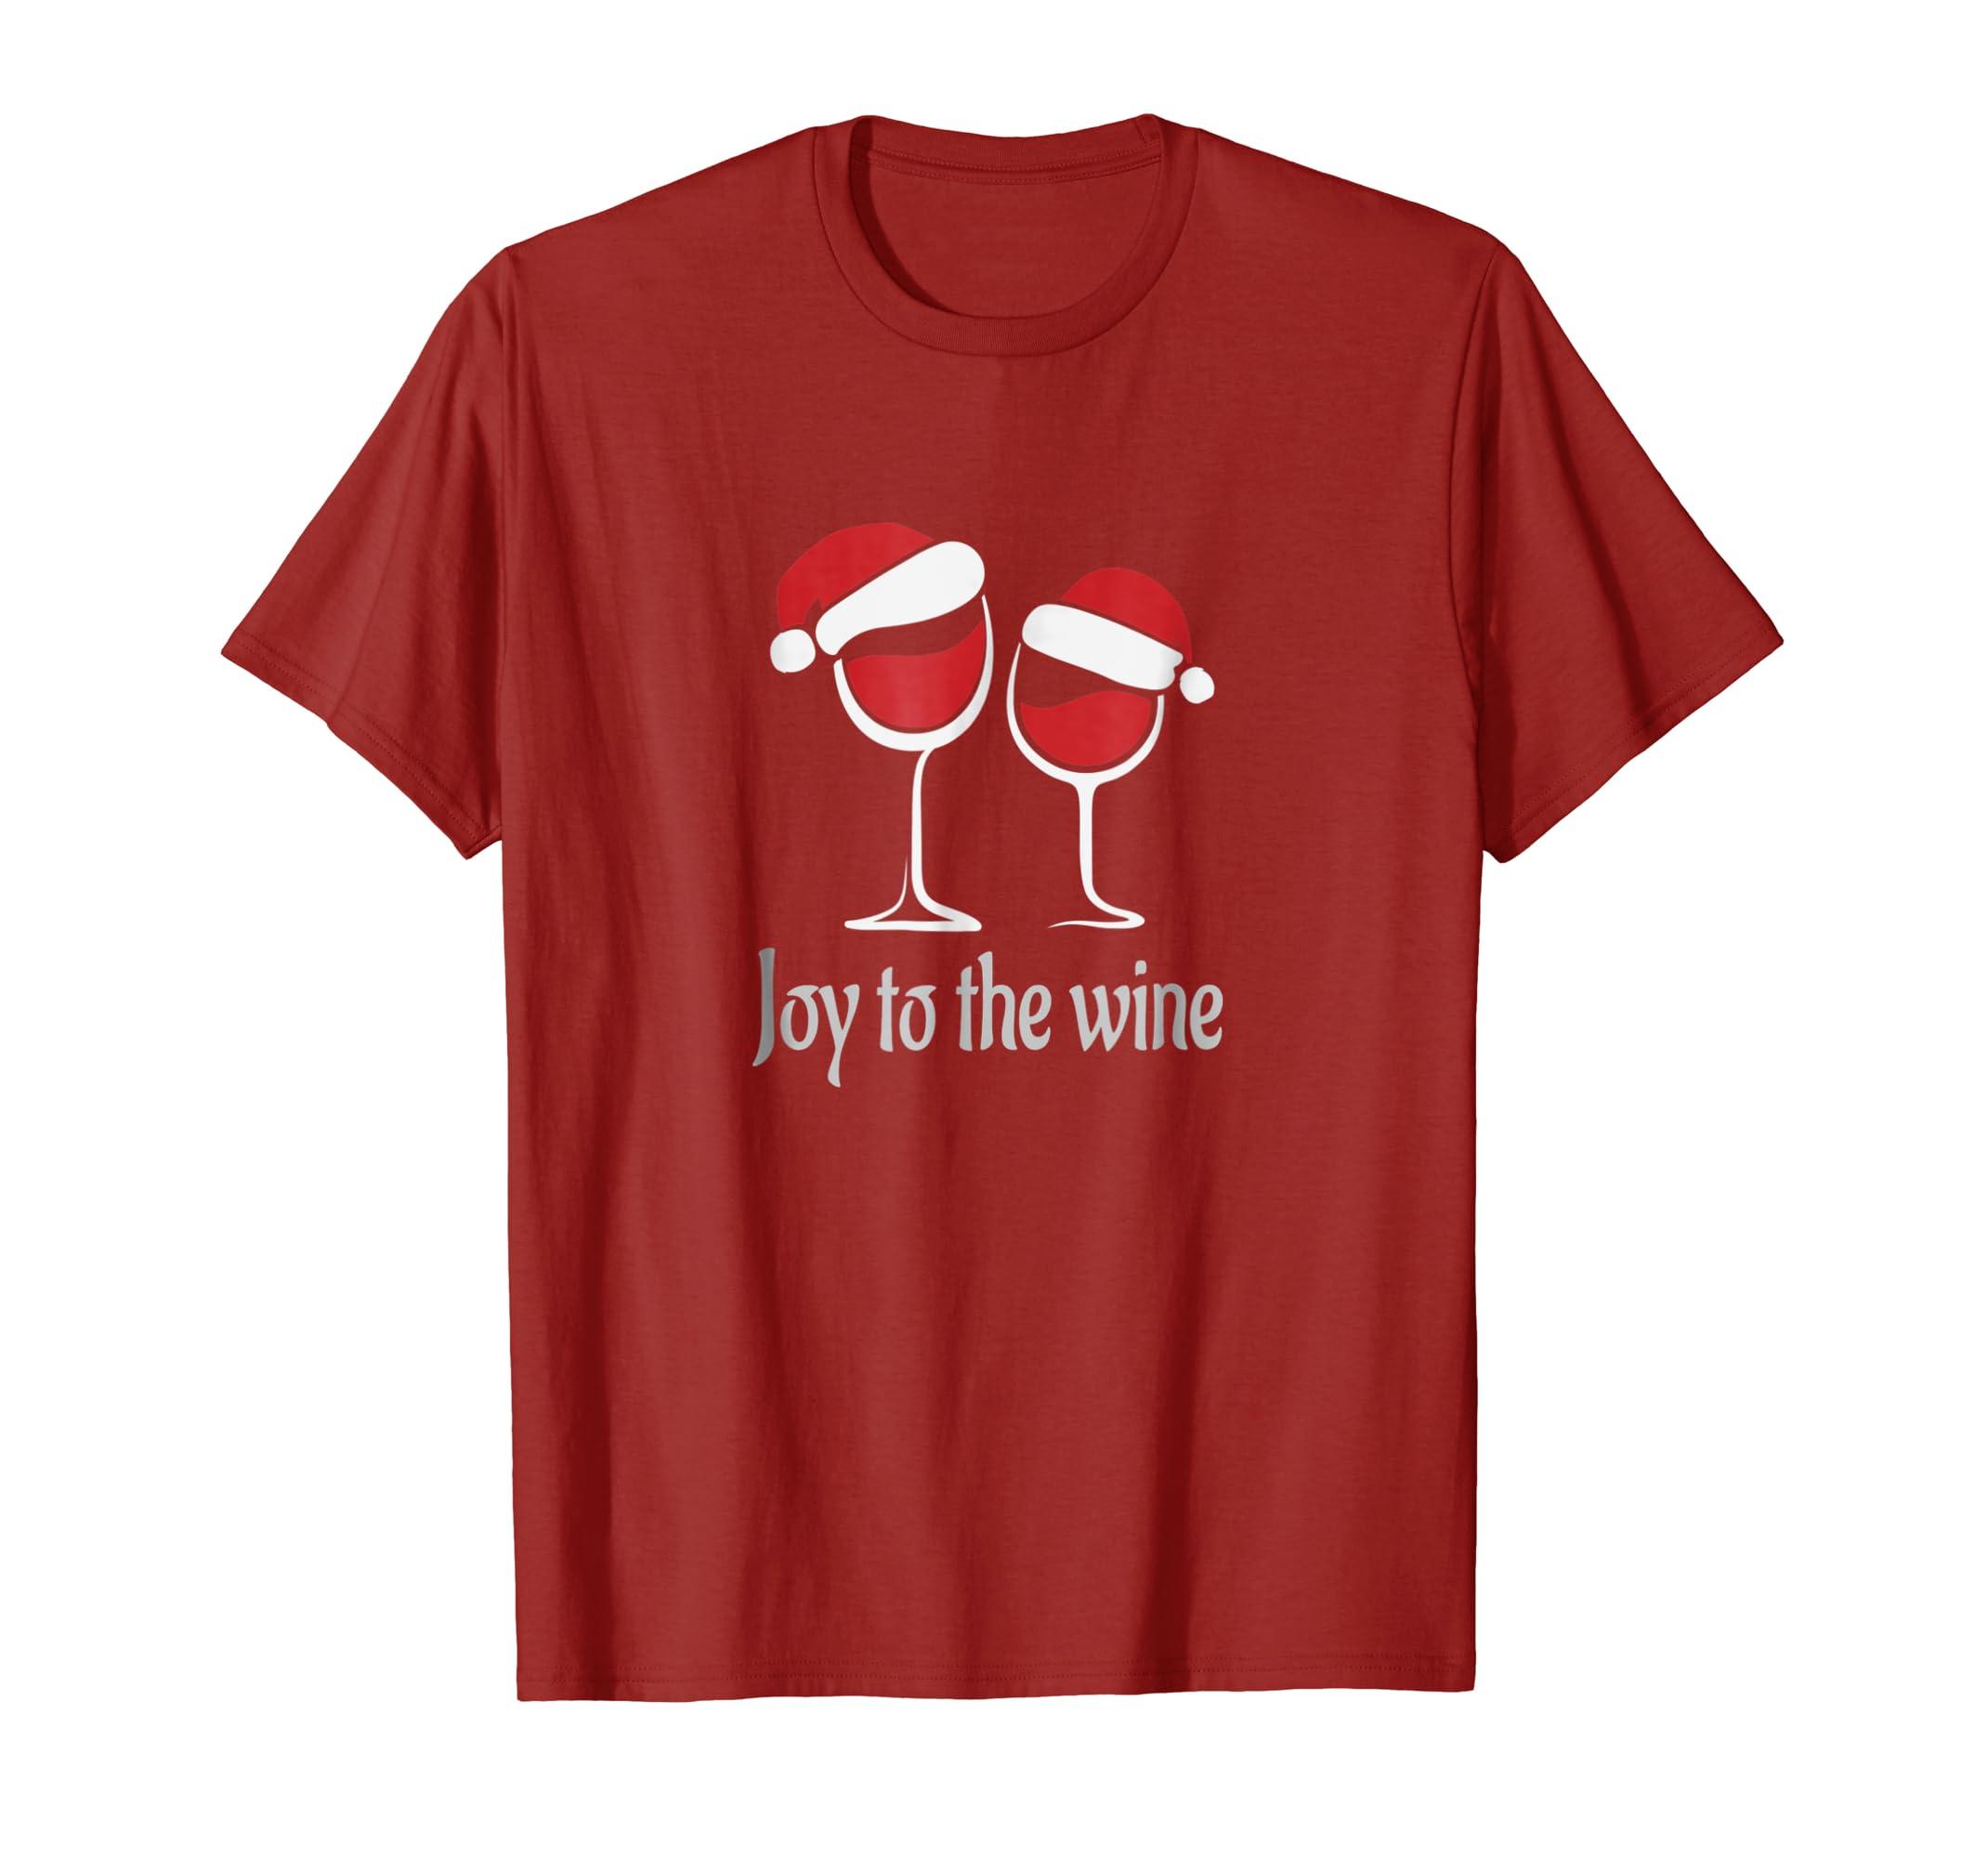 Wine Christmas Puns.Amazon Com Women S Funny Christmas Wine Lover Shirt Puns